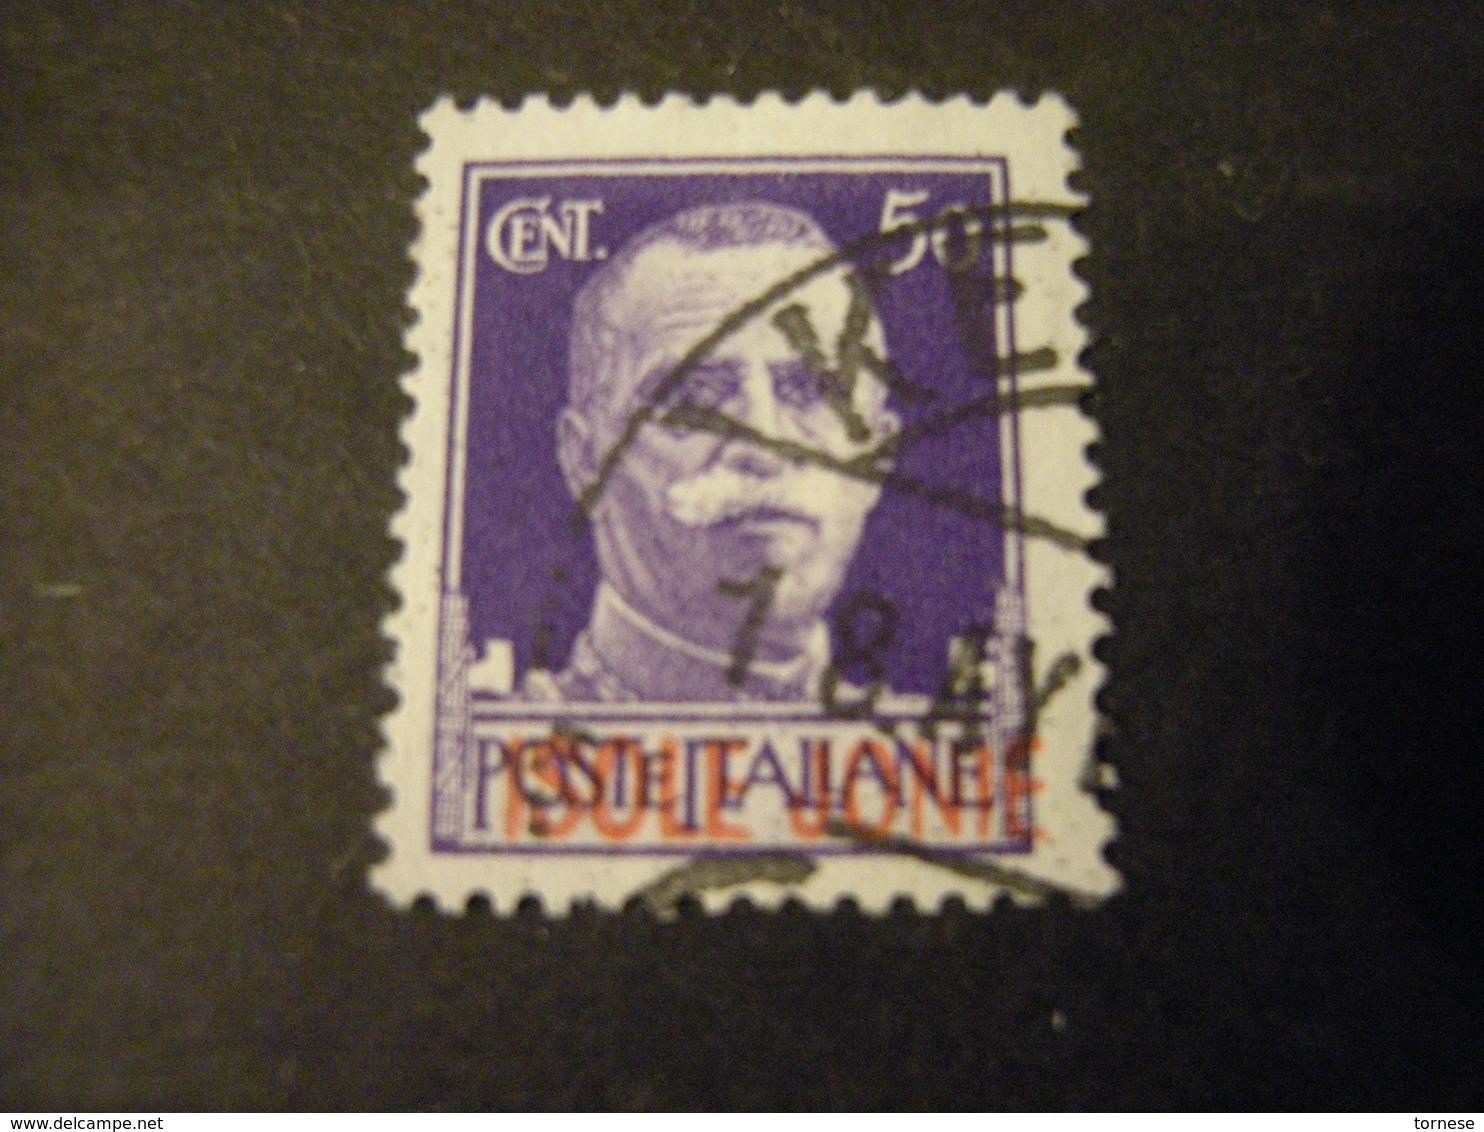 ISOLE JONIE - 1941, IMPERIALE, Sass. N. 6,  Cent. 50, Usato  TTB, OCCASIONE - 9. WW II Occupation (Italian)